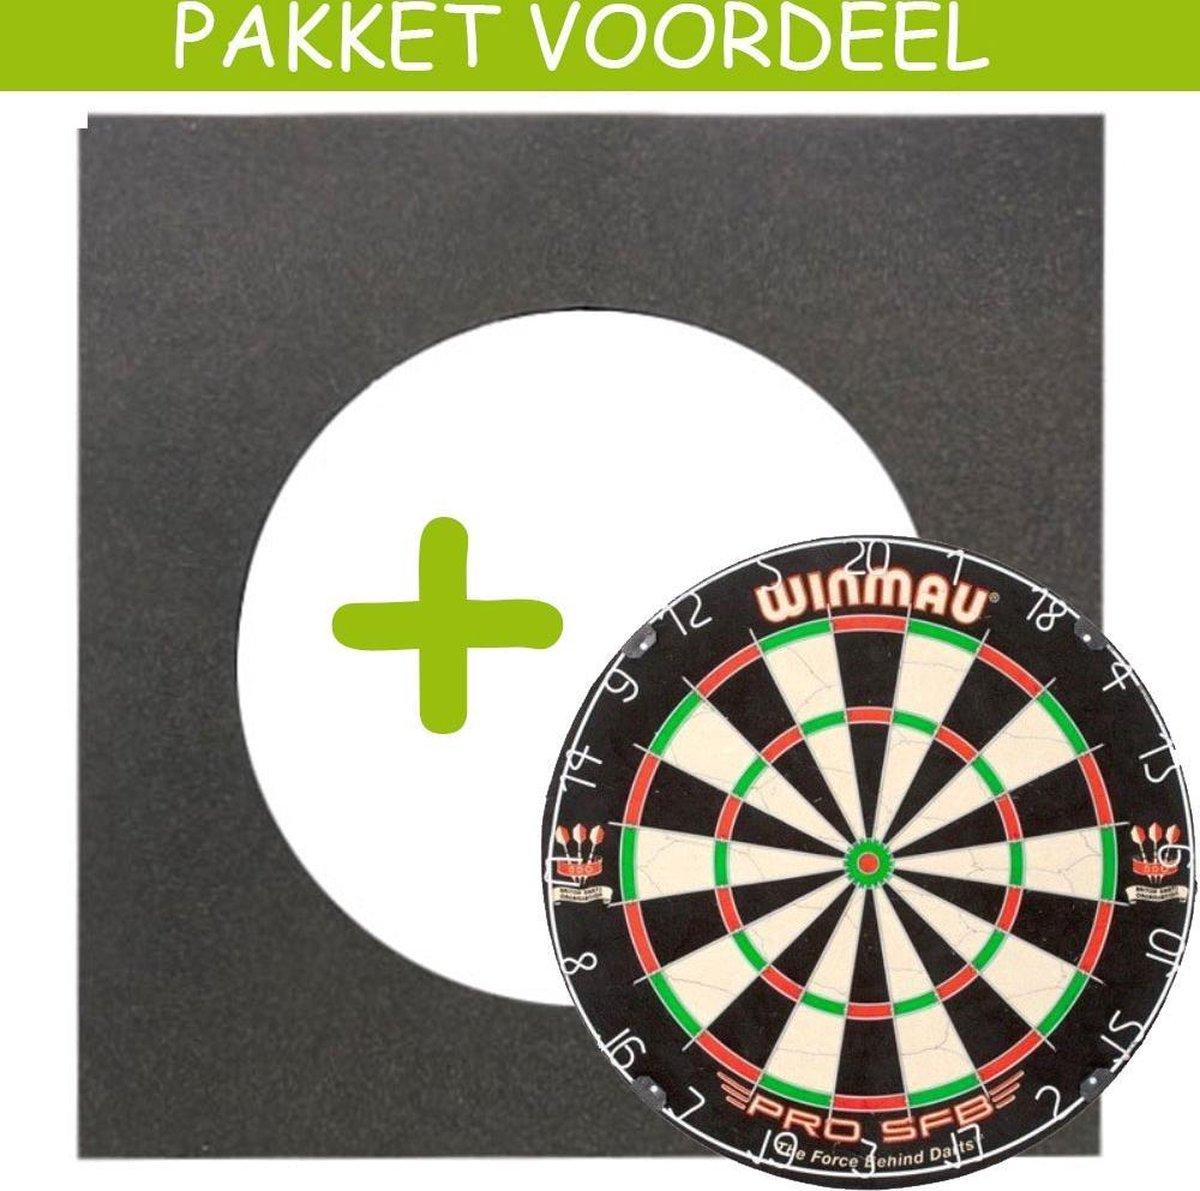 Surround VoordeelPakket Basic - Pro SFB - Vierkant-